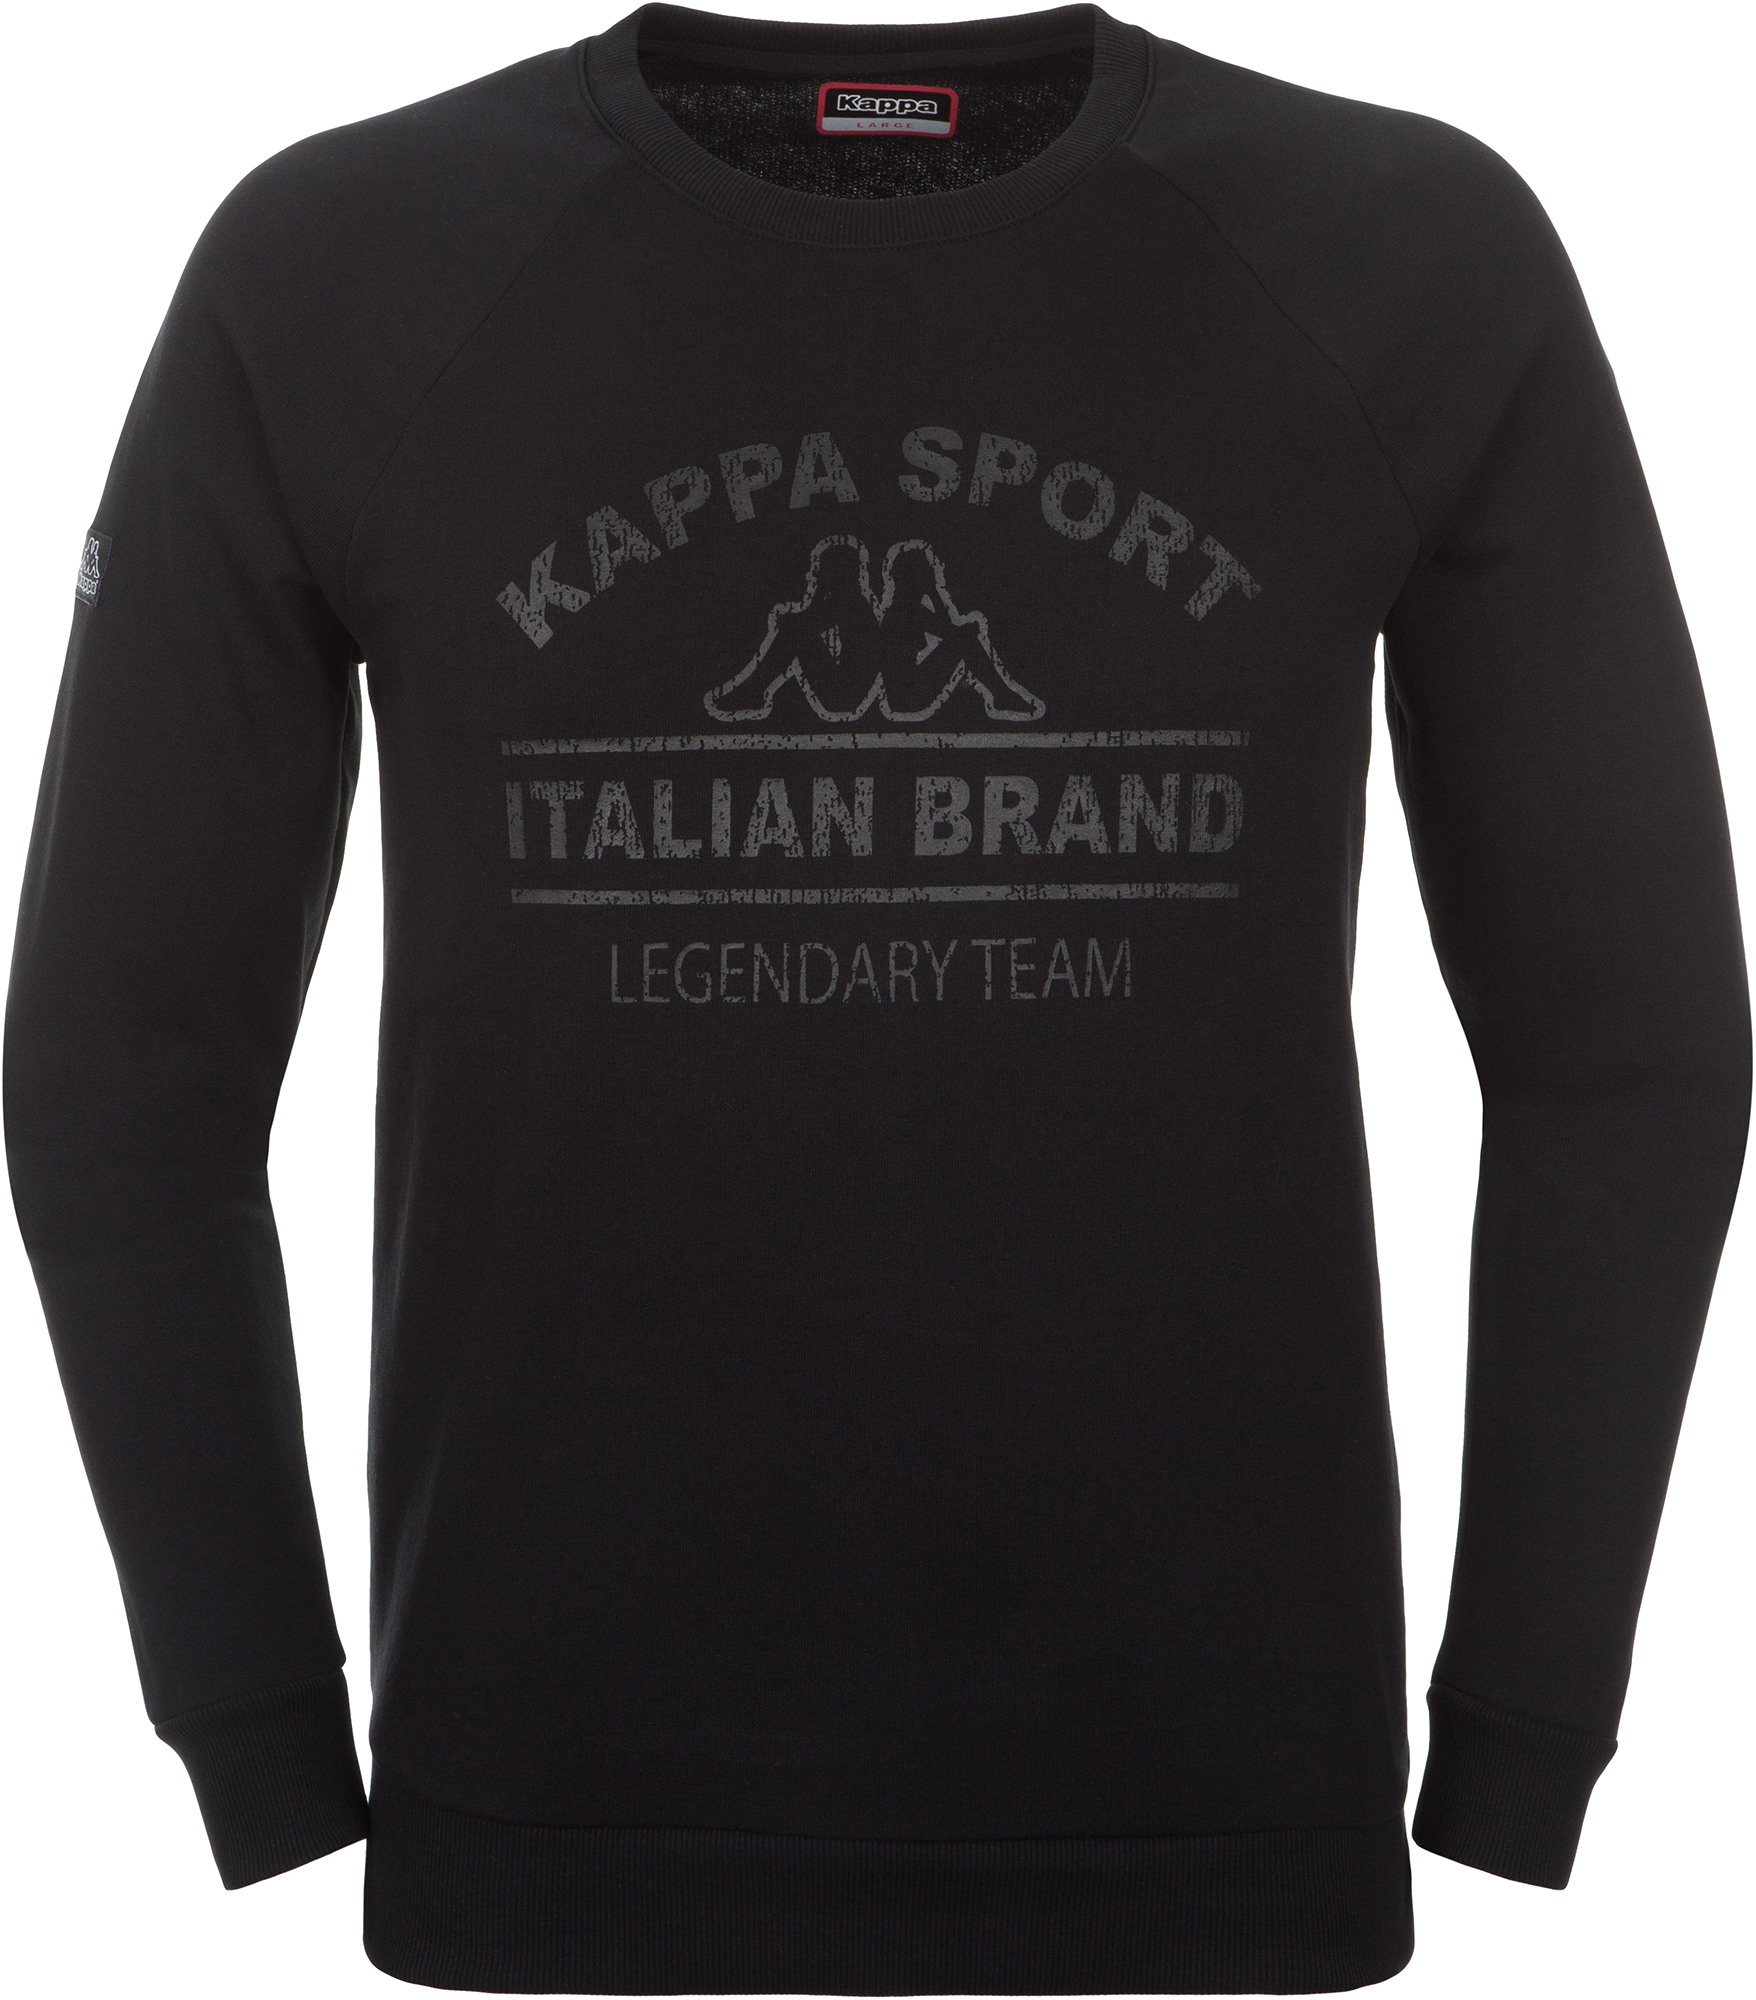 все цены на Kappa Джемпер мужской Kappa, размер 54 онлайн